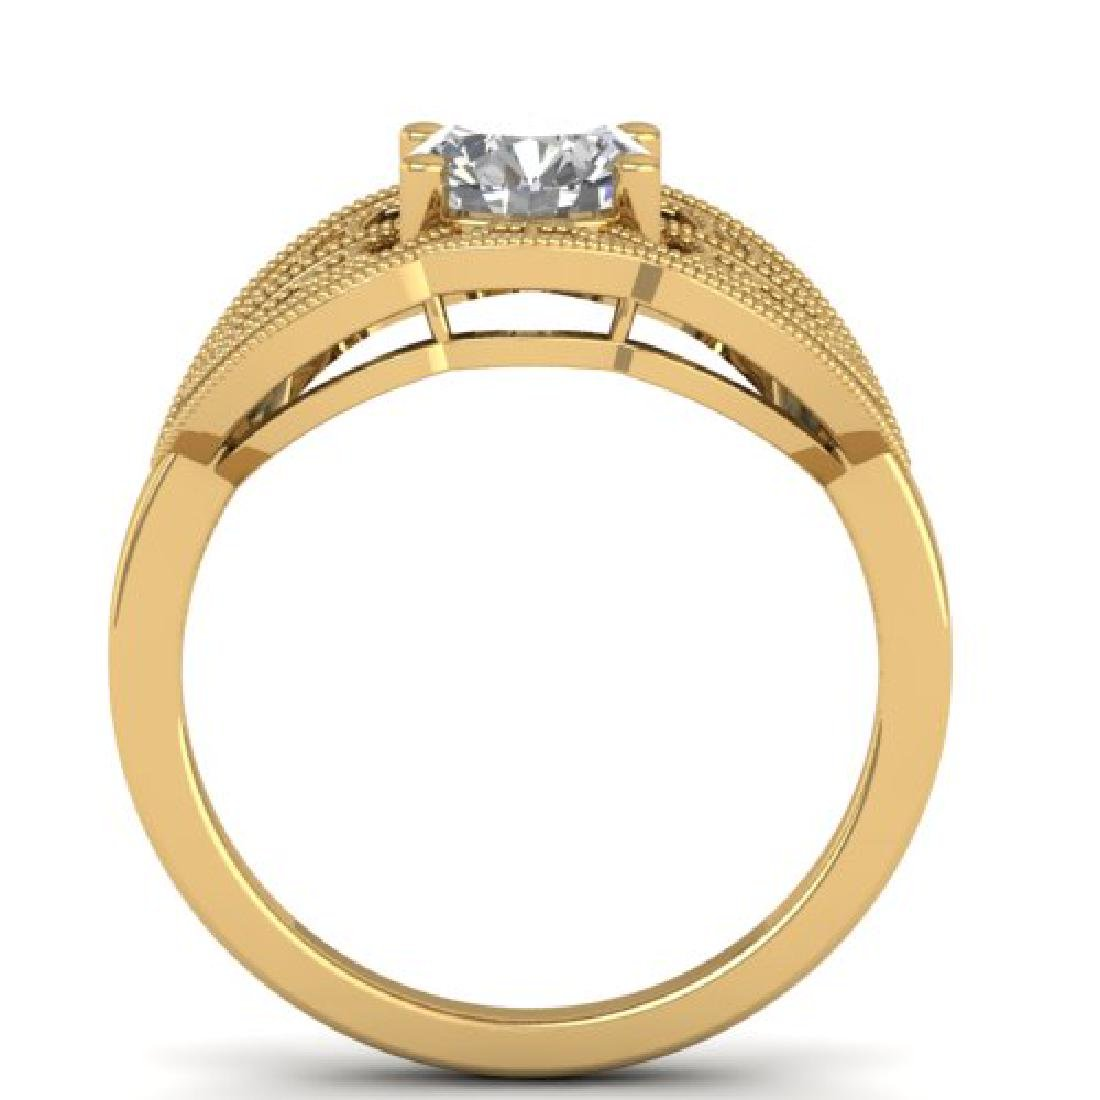 1.5 CTW Certified VS/SI Diamond Art Deco Micro Ring 18K - 3